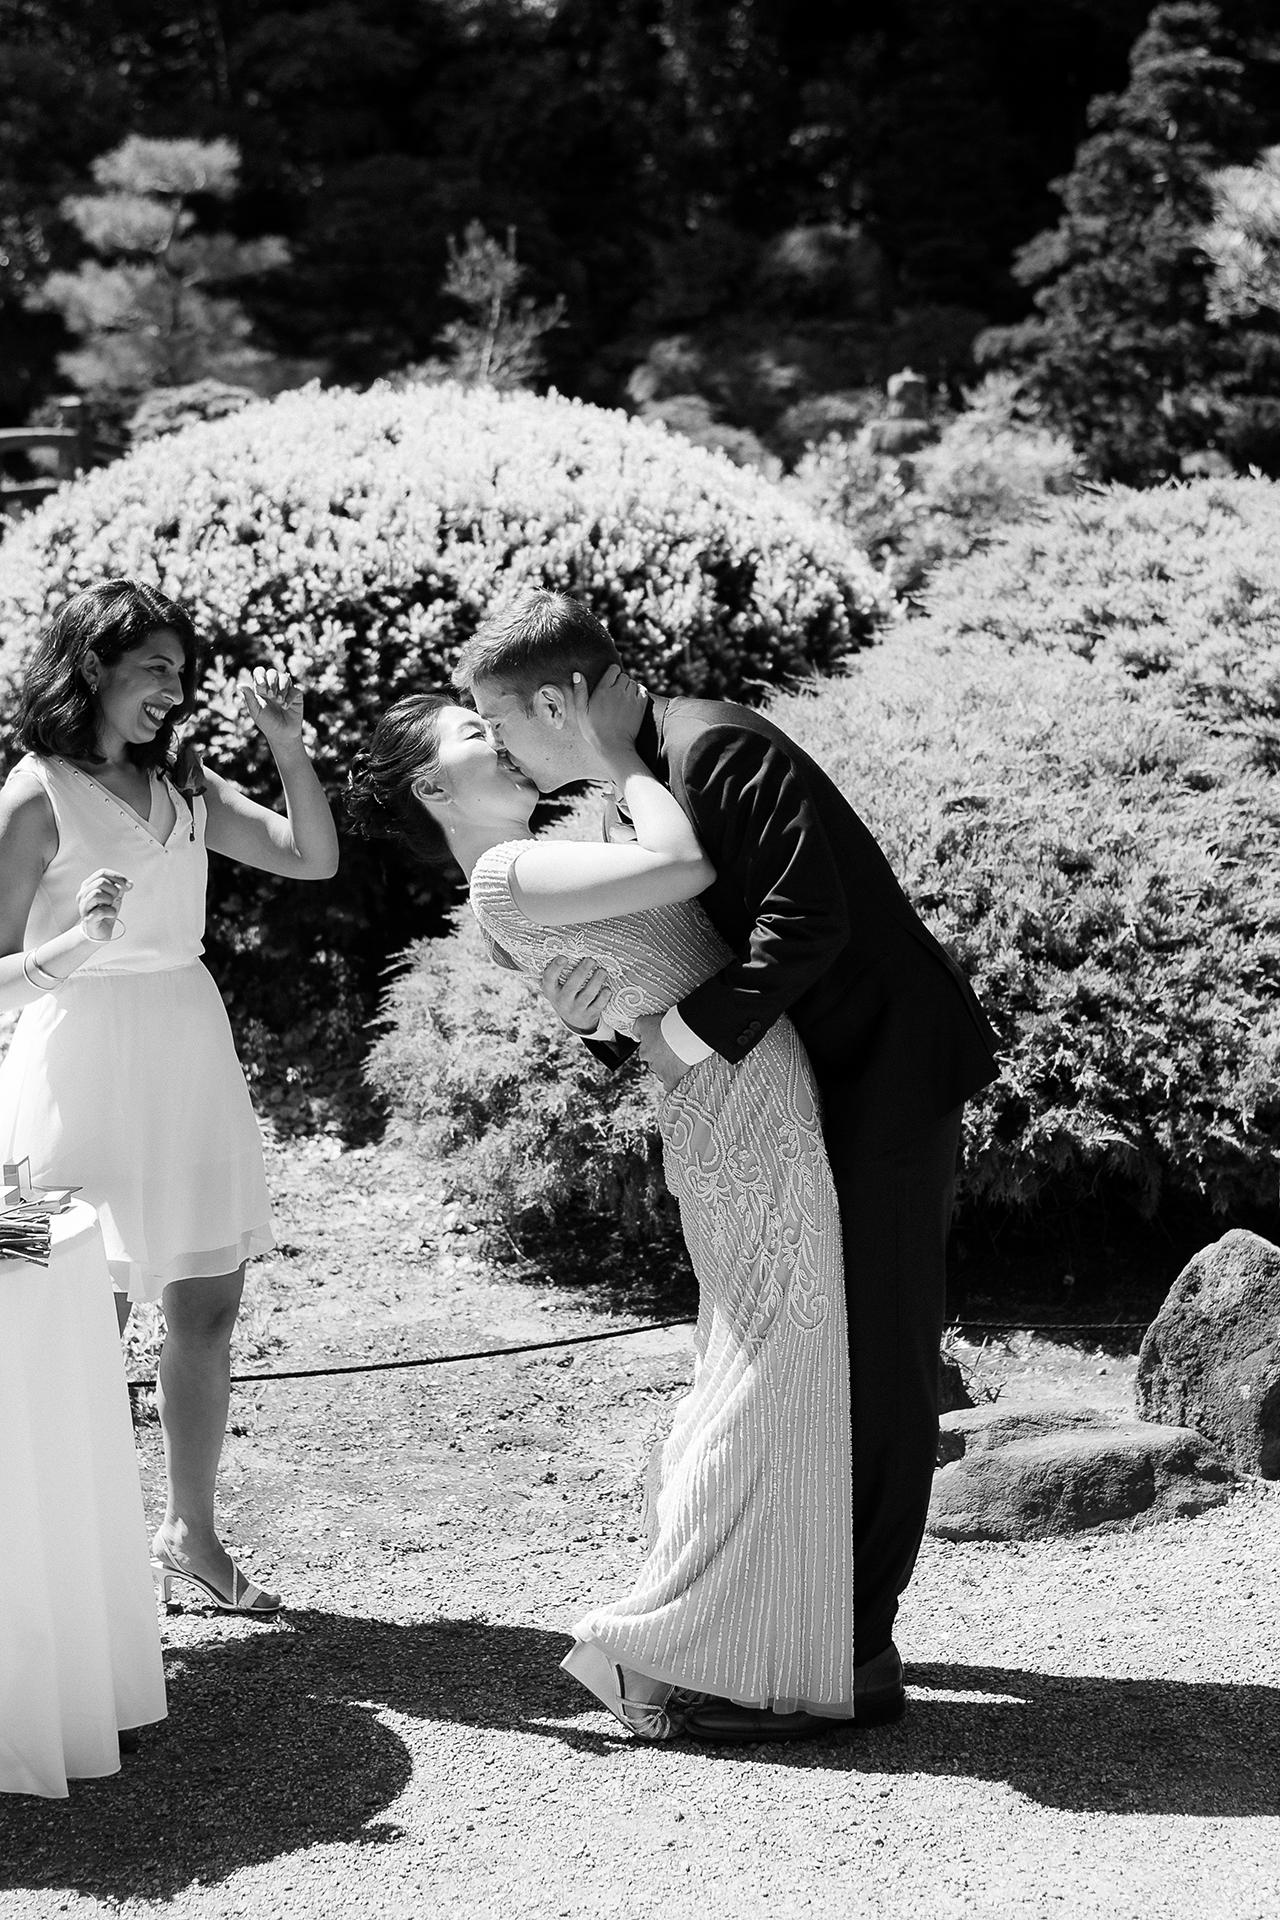 Hakone_Estate_and_Gardens_Wedding_026.jpg